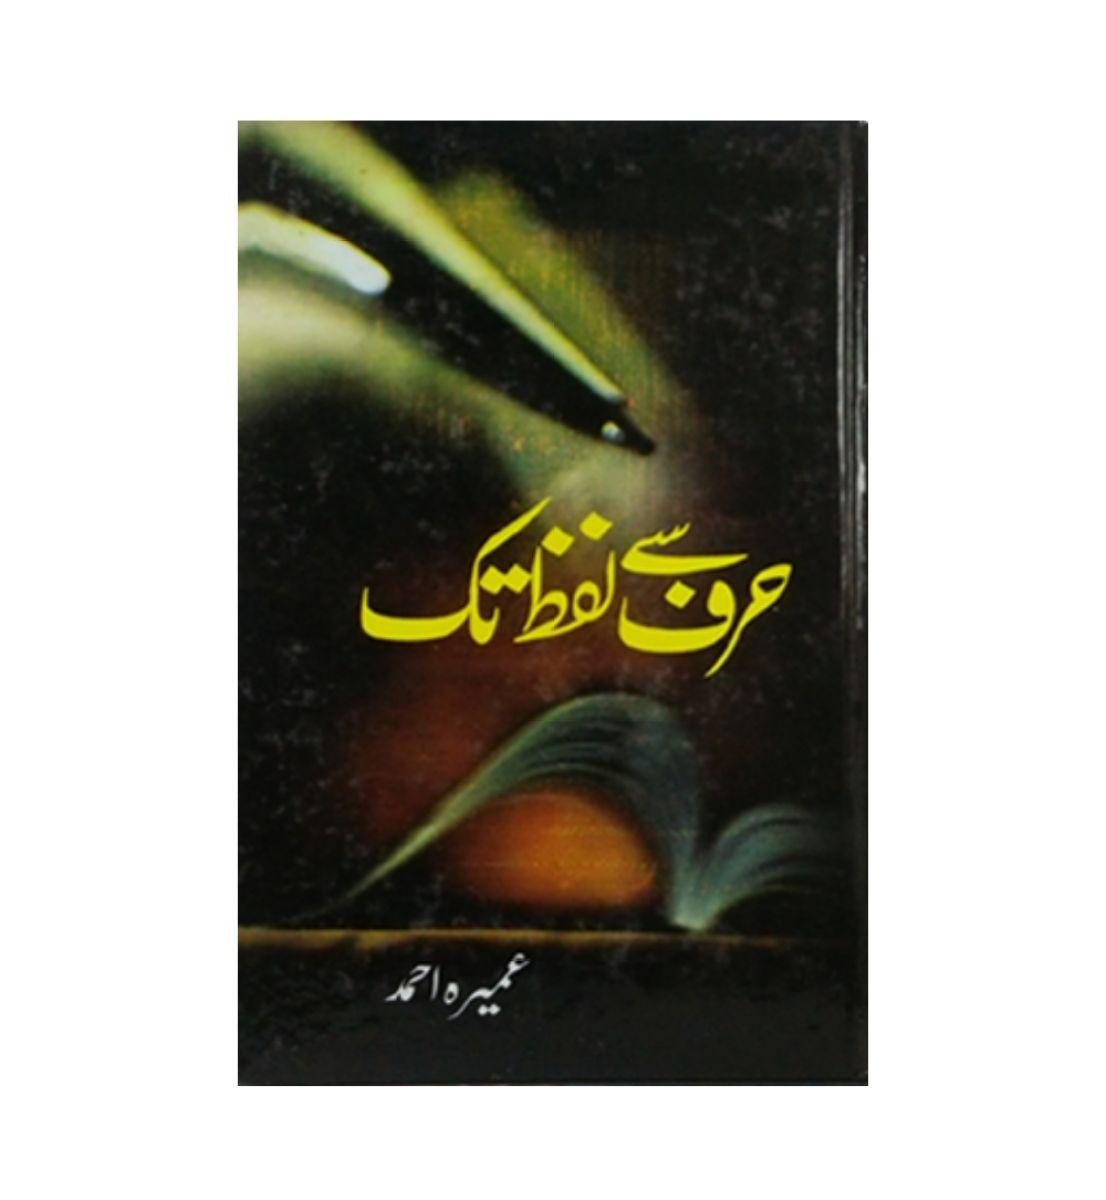 Hurf Say Lafz Tak Novel By Umaira Ahmad Pakistan's Best selling Urdu Reading Book